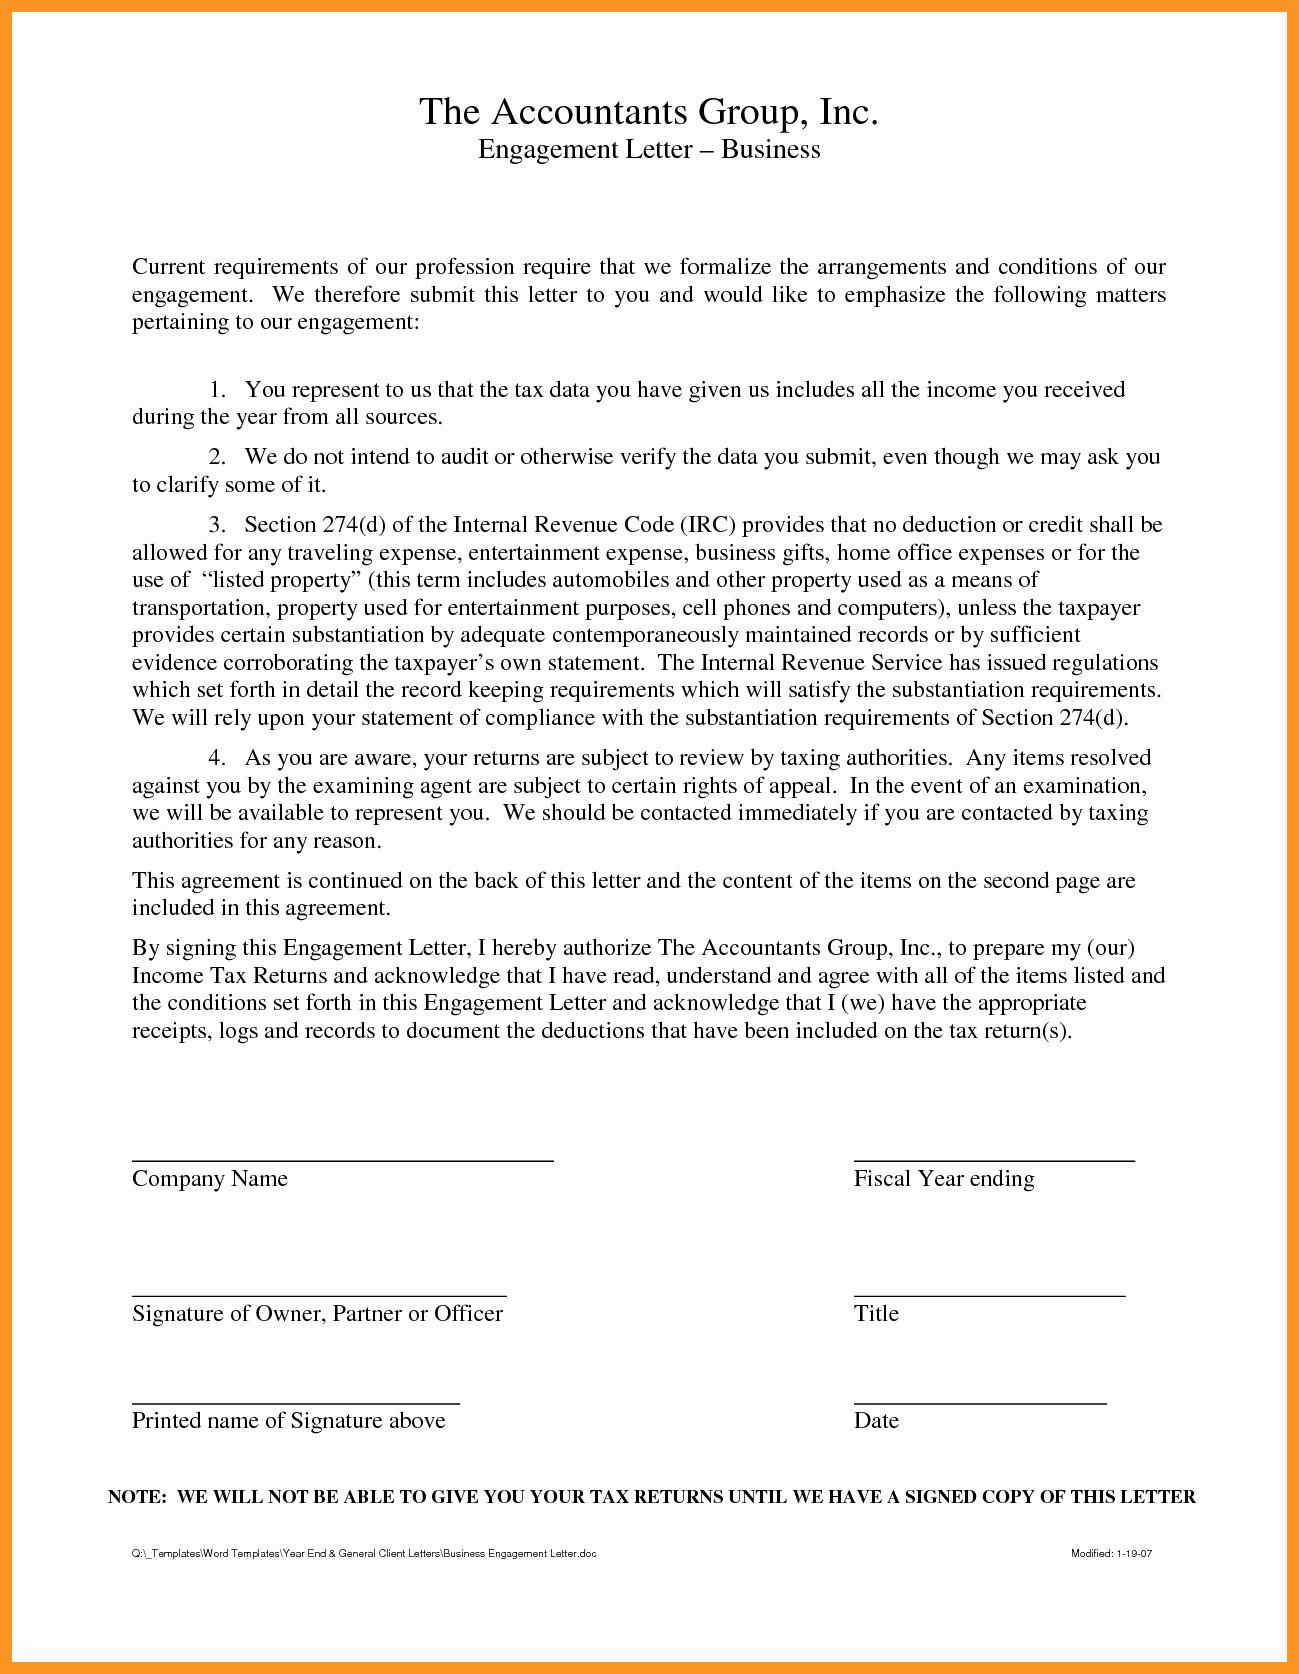 Formal Business Letter Template Word Lovely Business Letter format Template Word